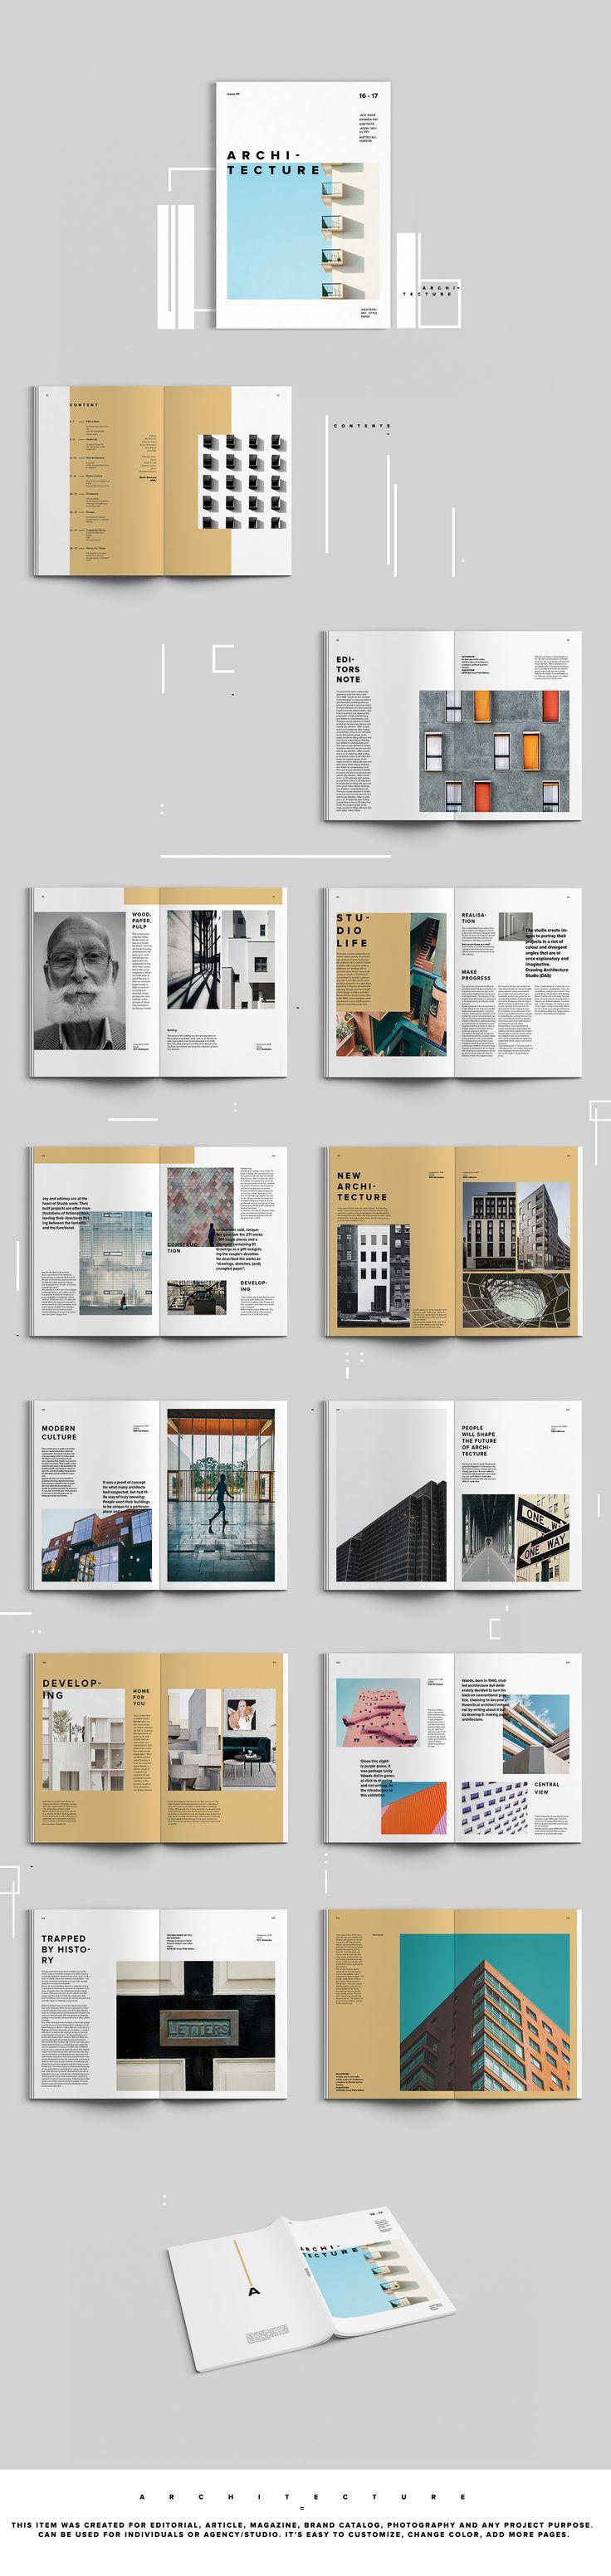 Best 25 Architecture Magazines Ideas On Pinterest